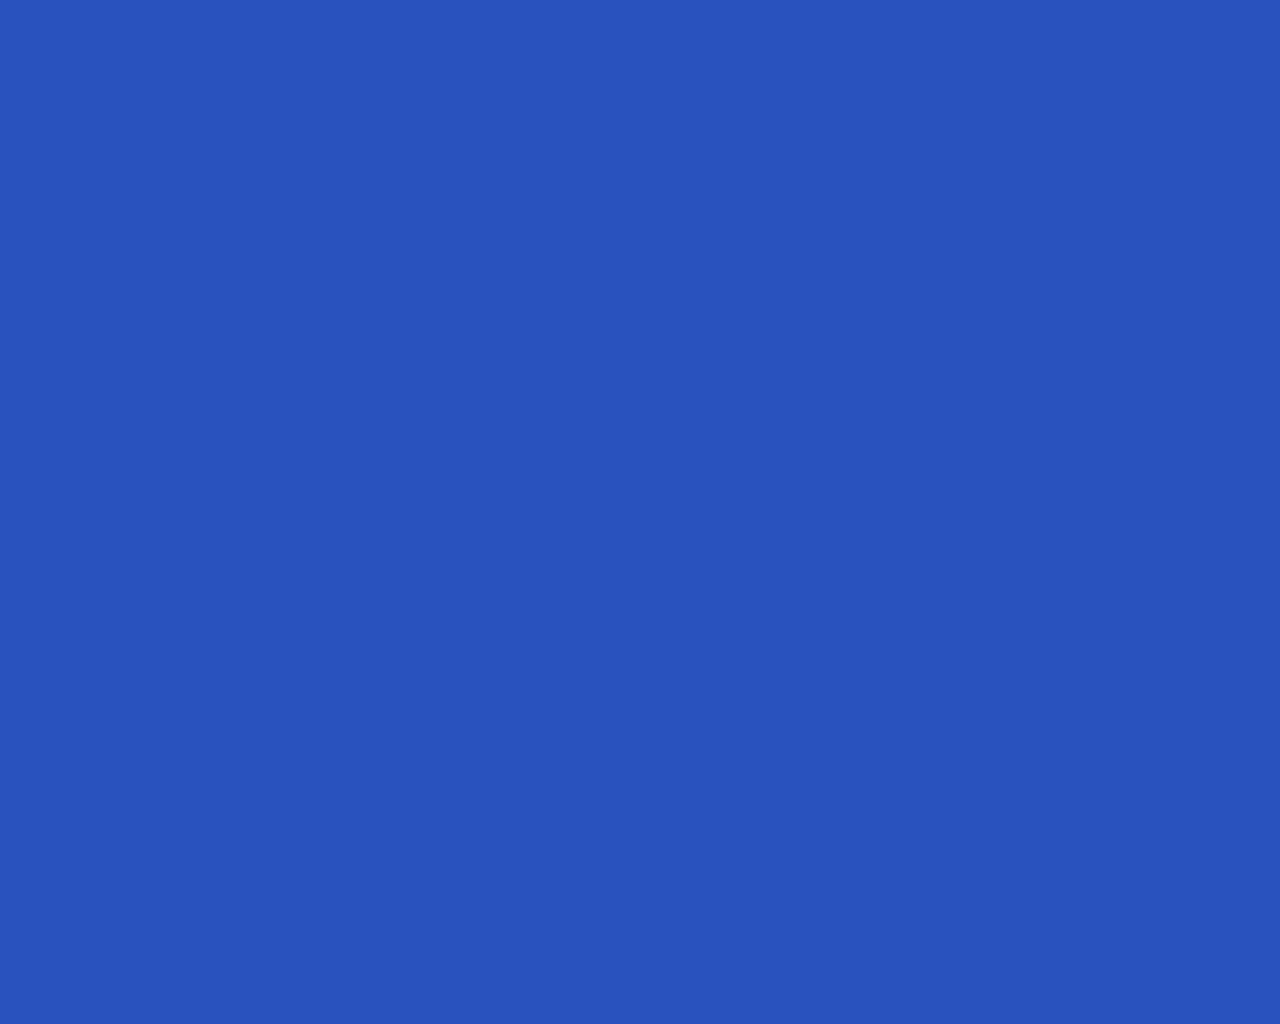 1280x1024 Cerulean Blue Solid Color Background